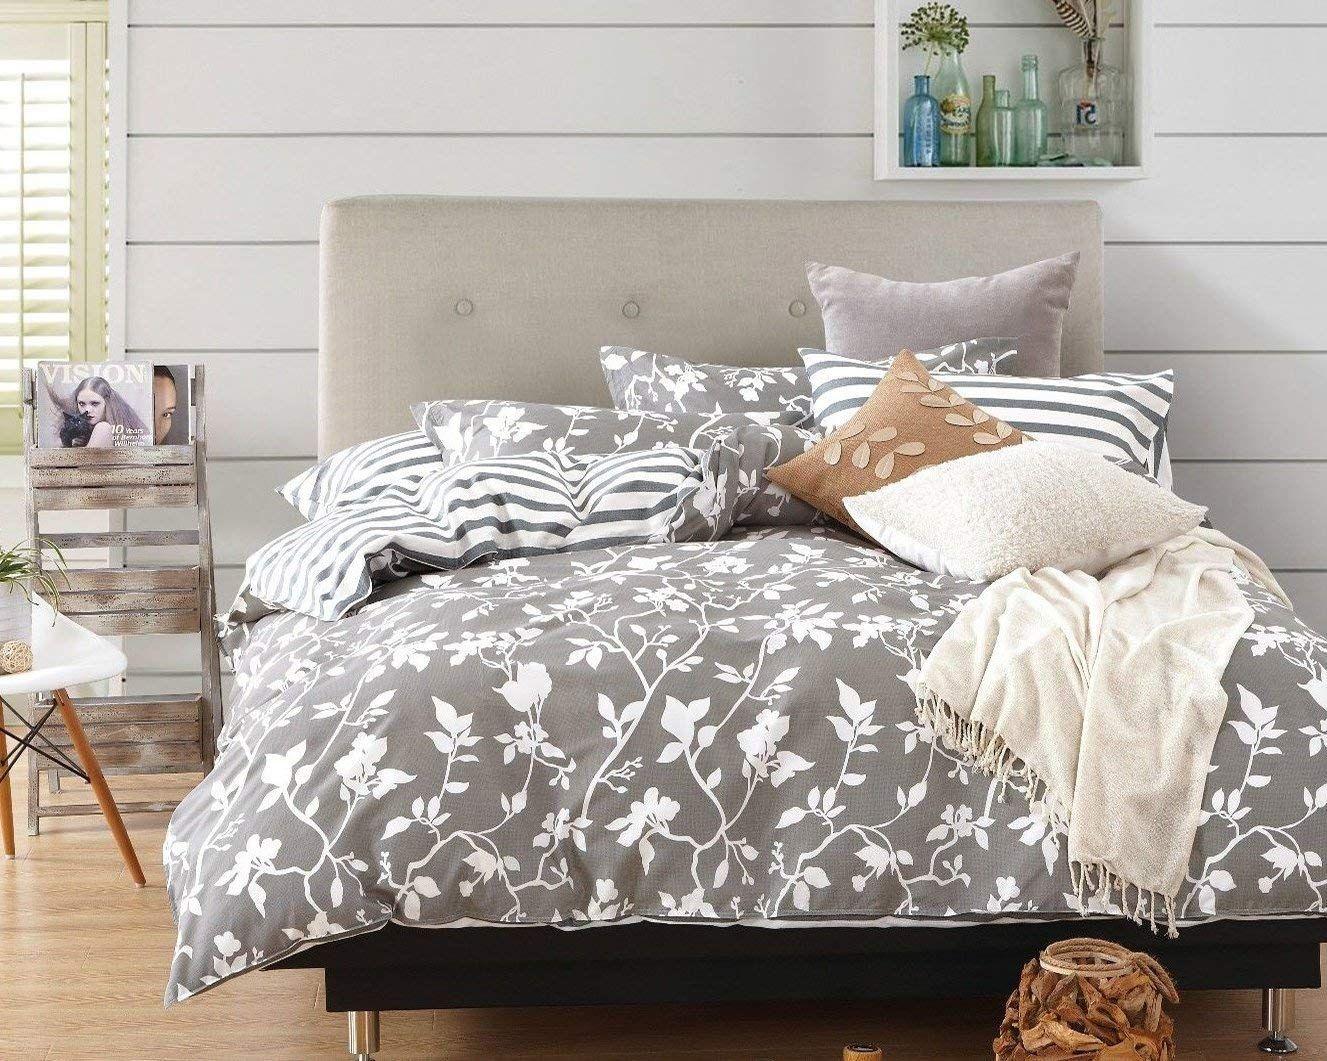 Swanson Beddings Leafy Vines 3-Piece 100% Cotton Bedding Set